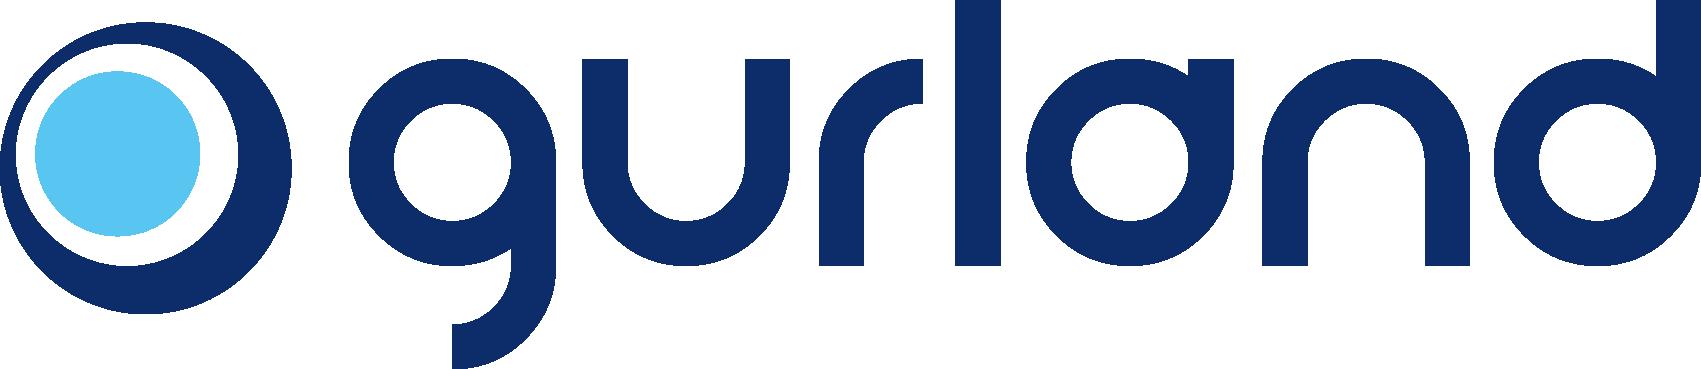 Gurland Corporation Logo